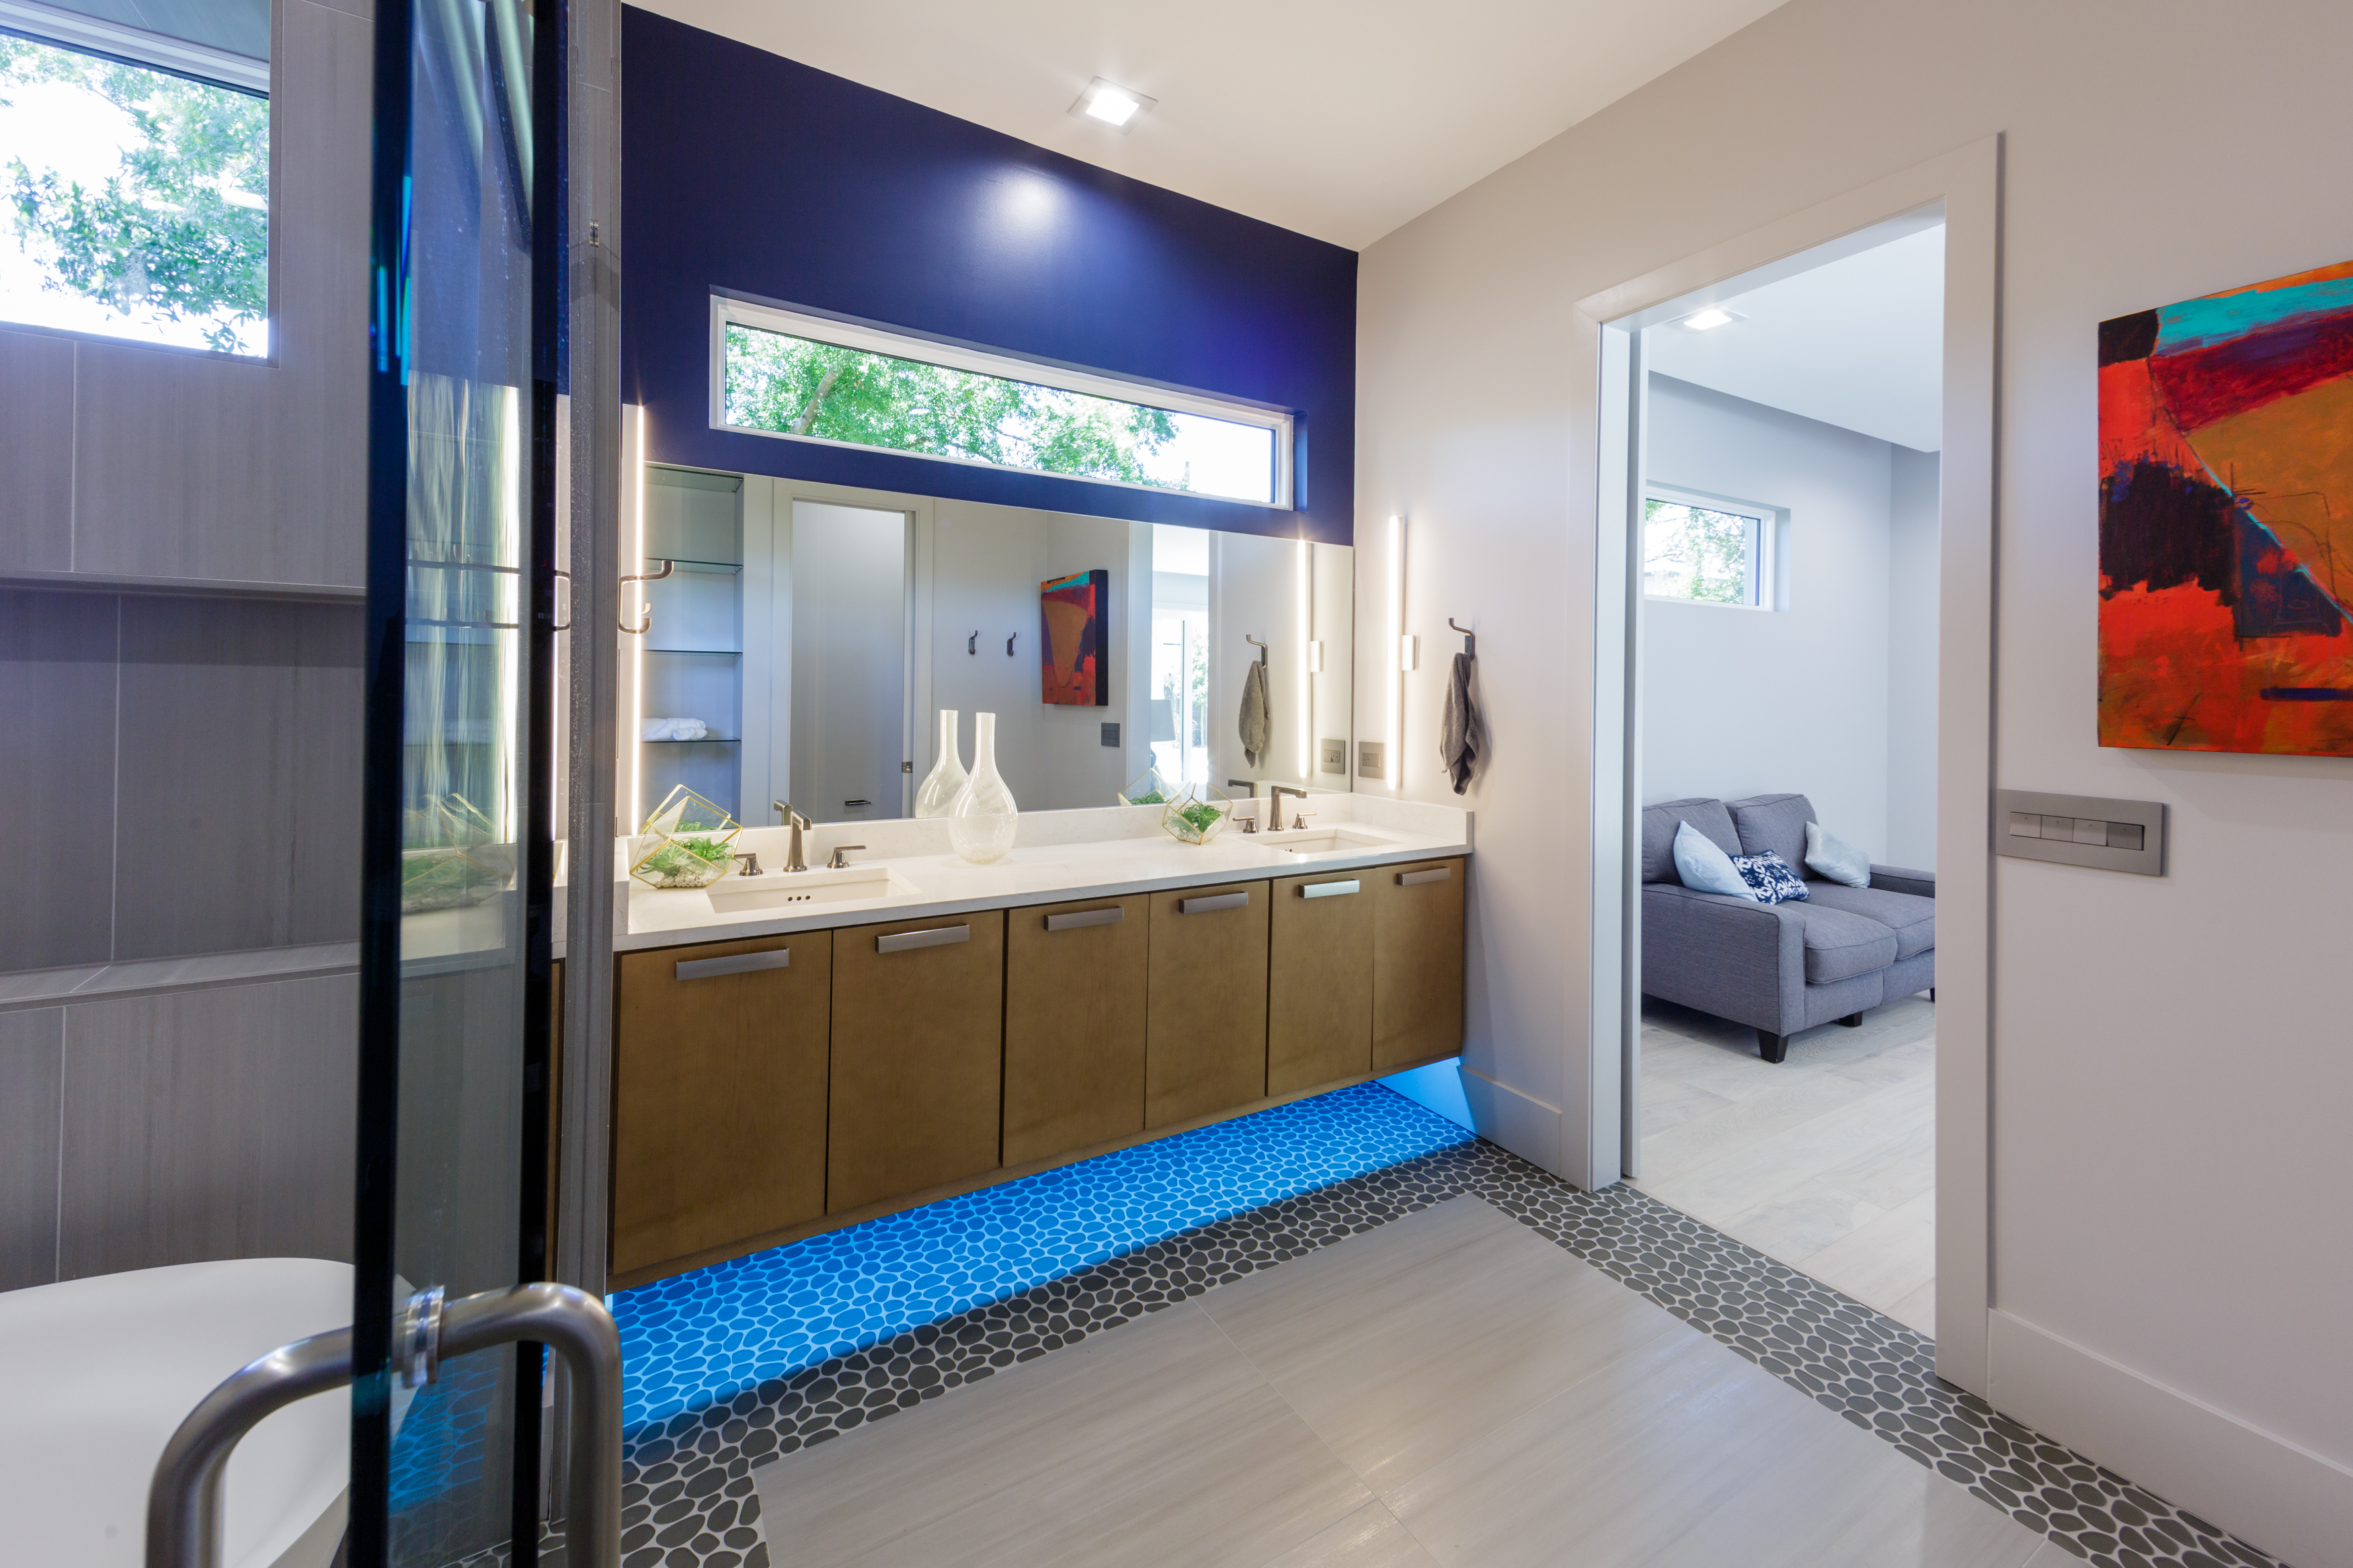 Grinnell Modern: Master Bath Vanity